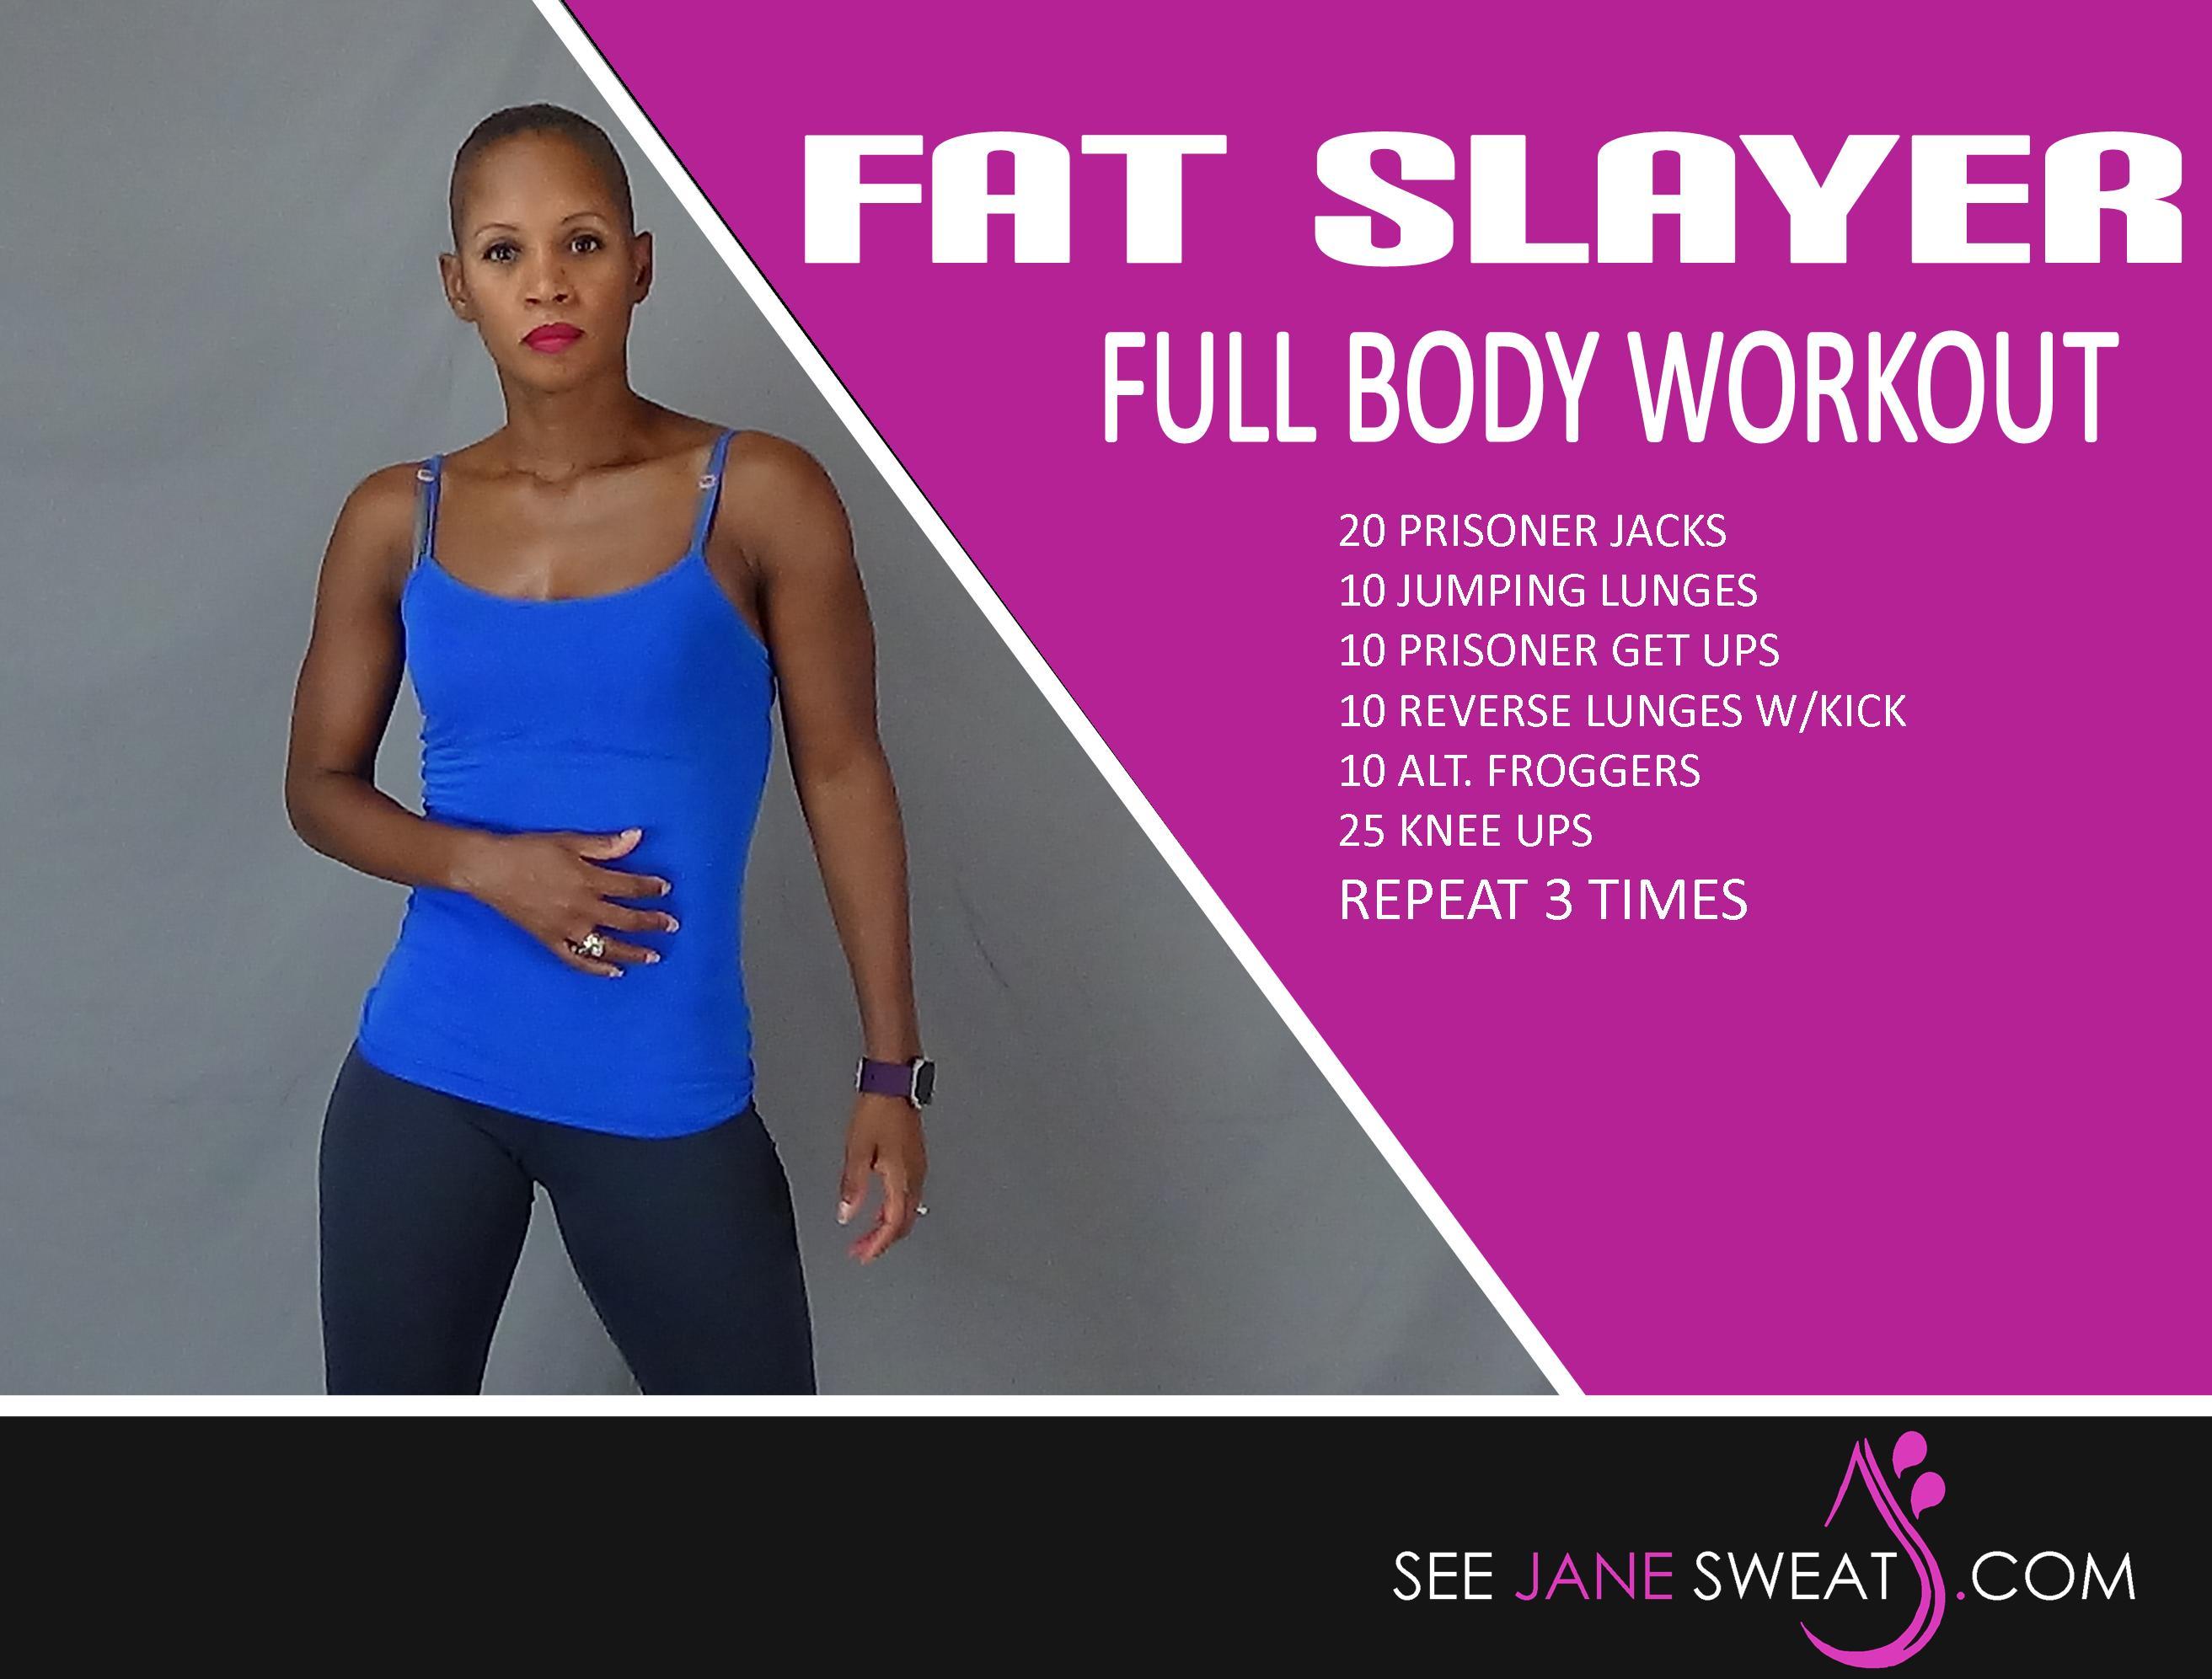 Fat Slayer Full Body Workout